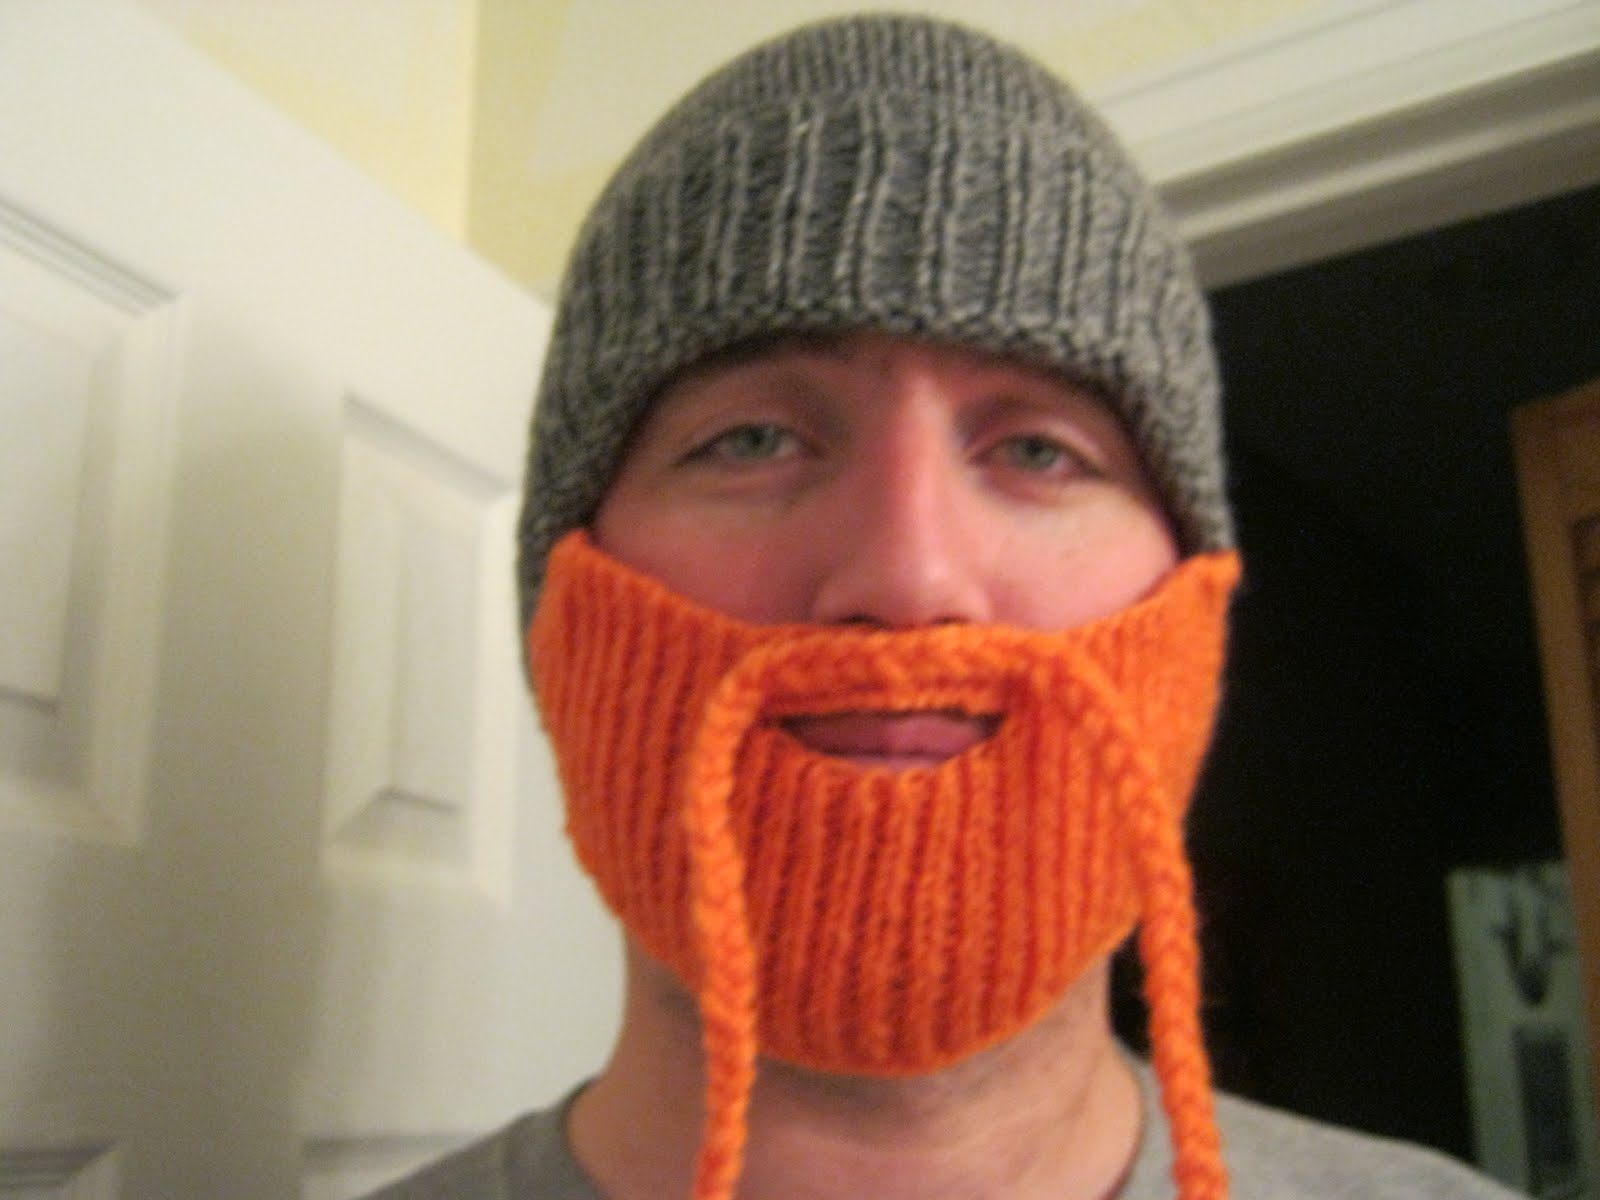 Knittens: Mountain Man bearded cap